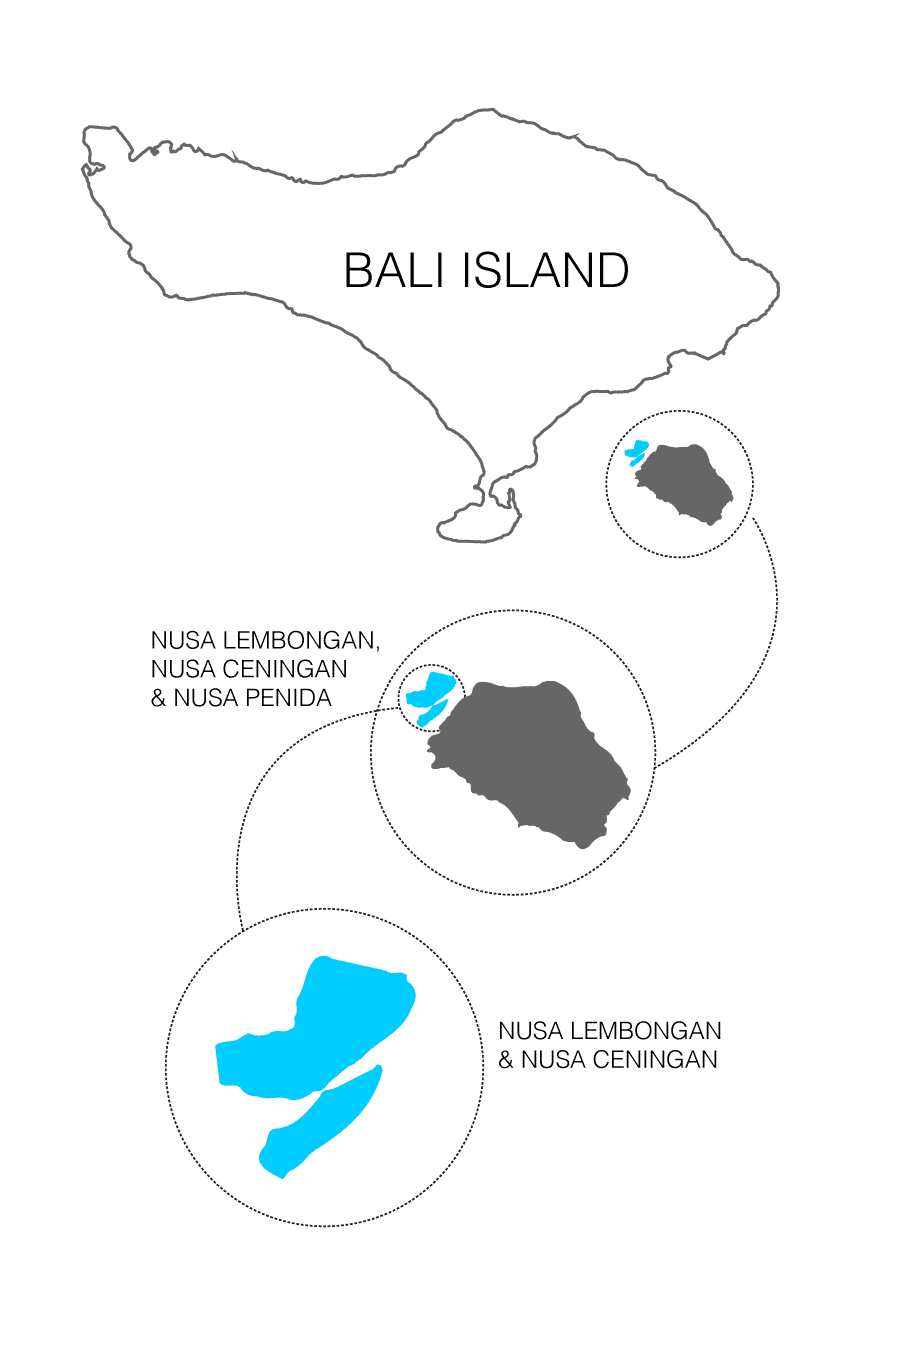 Nusa Lembongan Lembongan Island